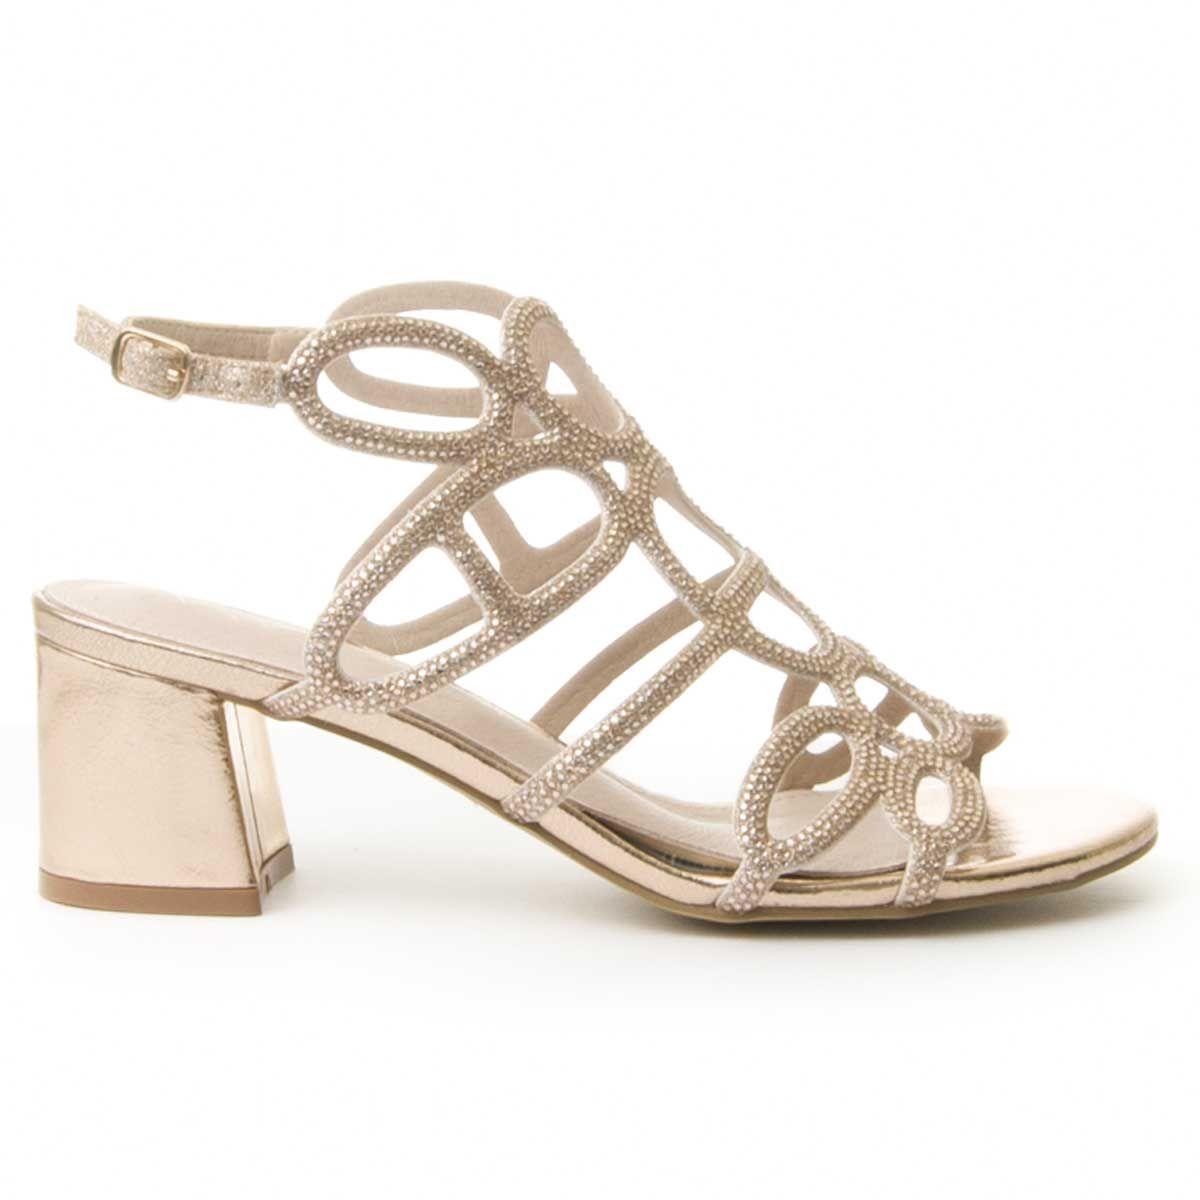 Montevita Block Heel Sandal in Pink